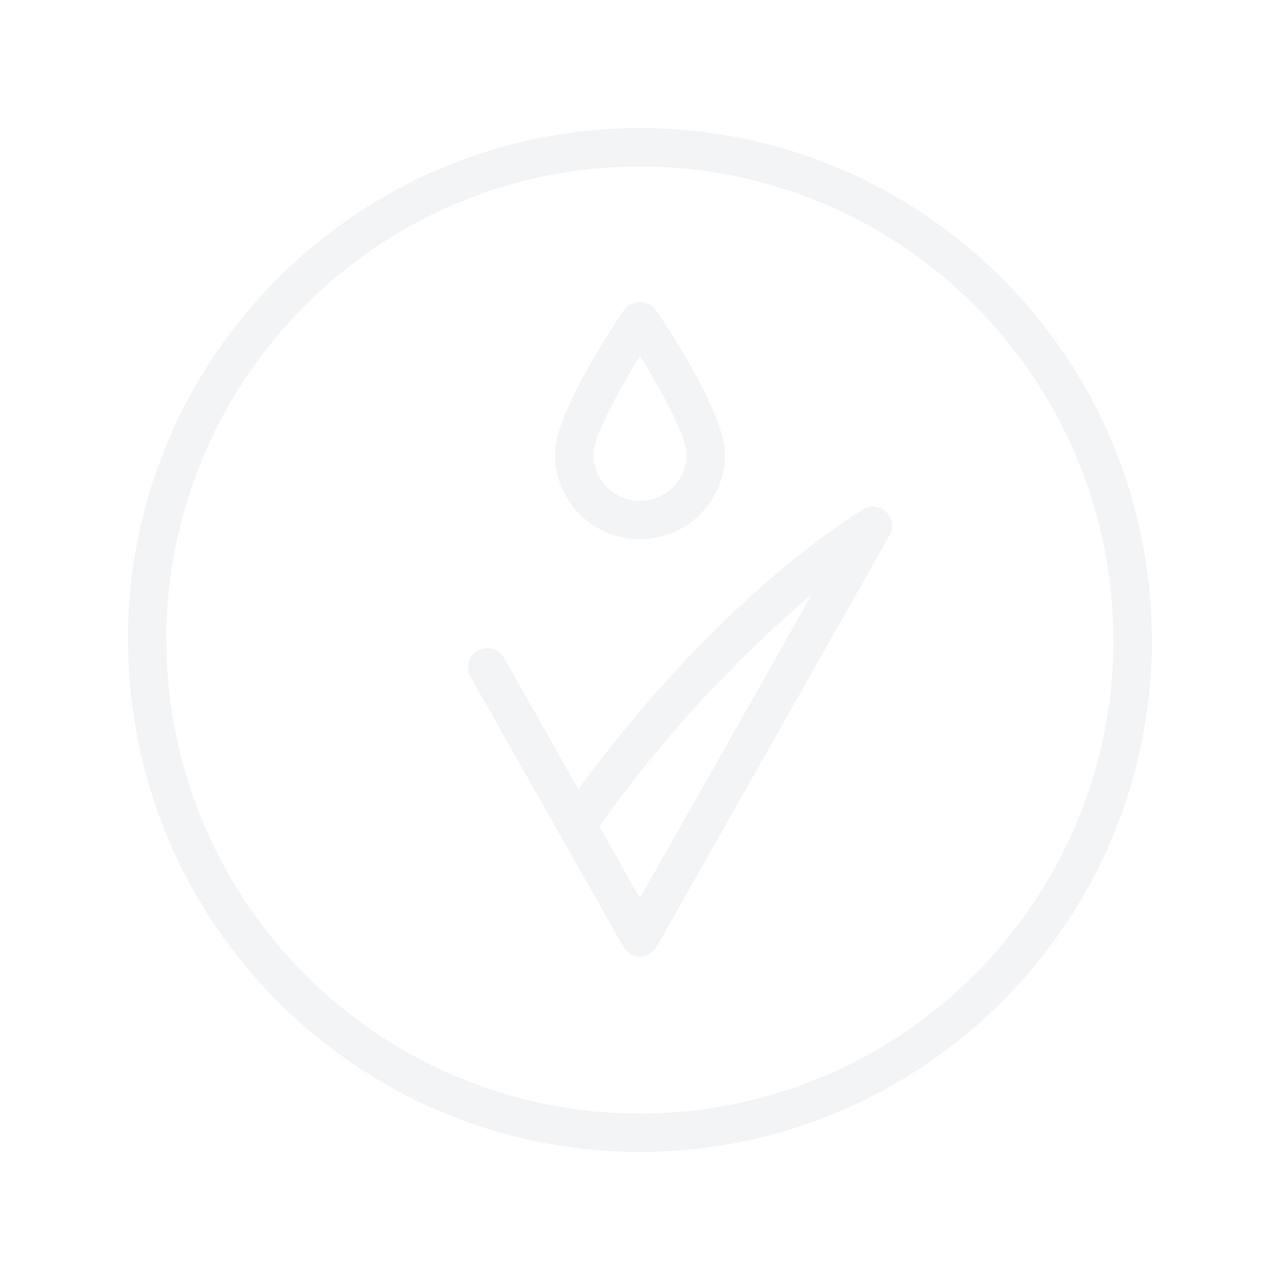 Helena Rubinstein Lash Queen Perfect Blacks Mascara No.01 Lasting Black 7ml